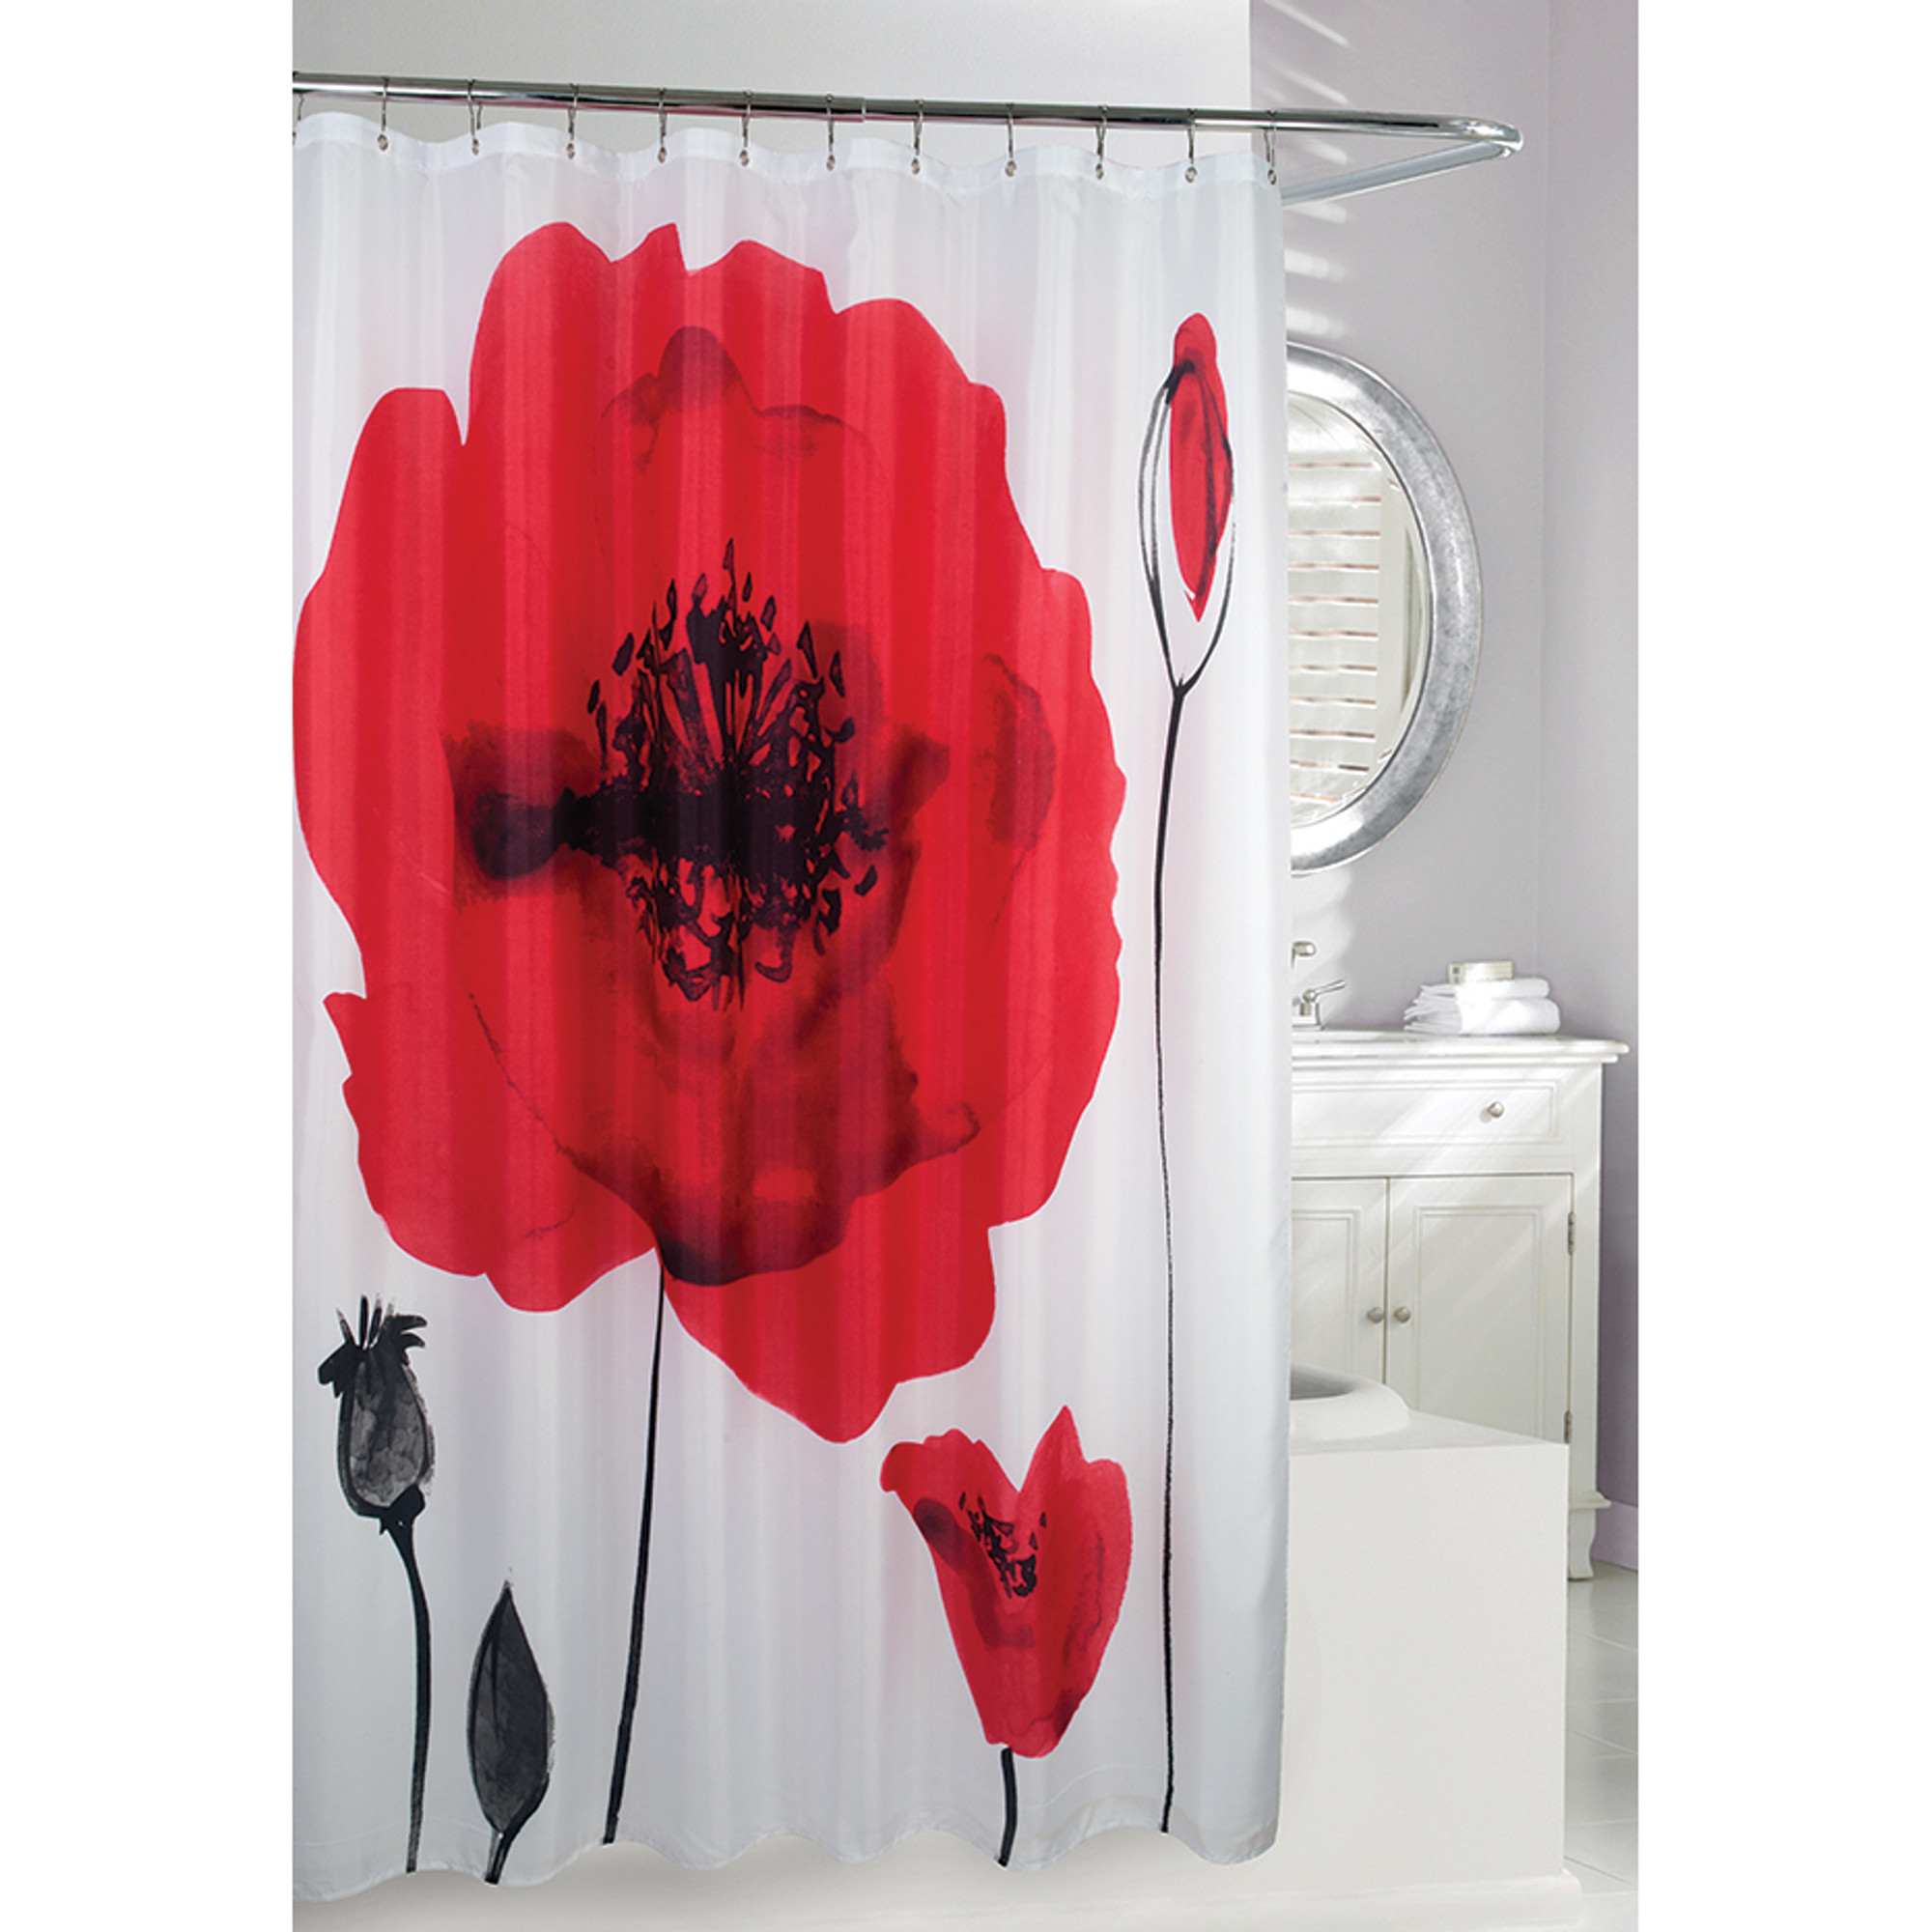 poppy explosion fabric shower curtain